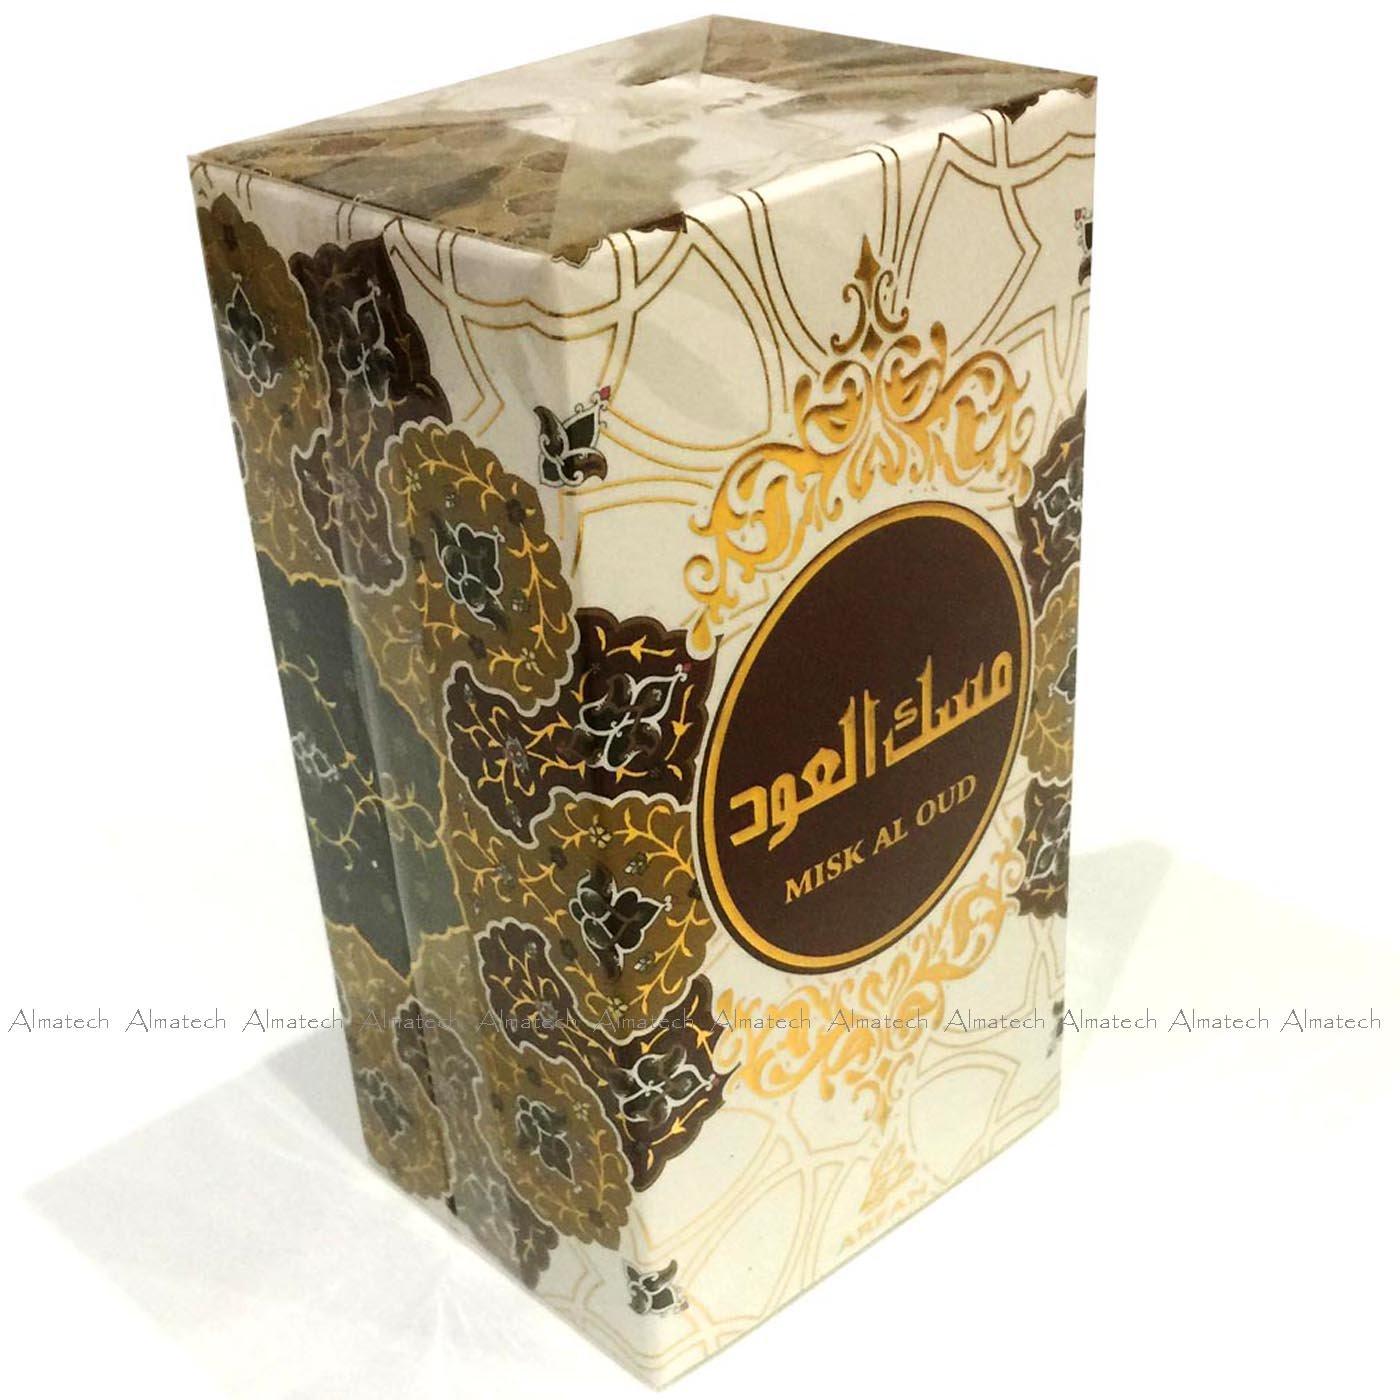 Misk Al Oud By Arfan Oudh Al Anfar Oriental Fragrance EDP Perfume Spray 100ml